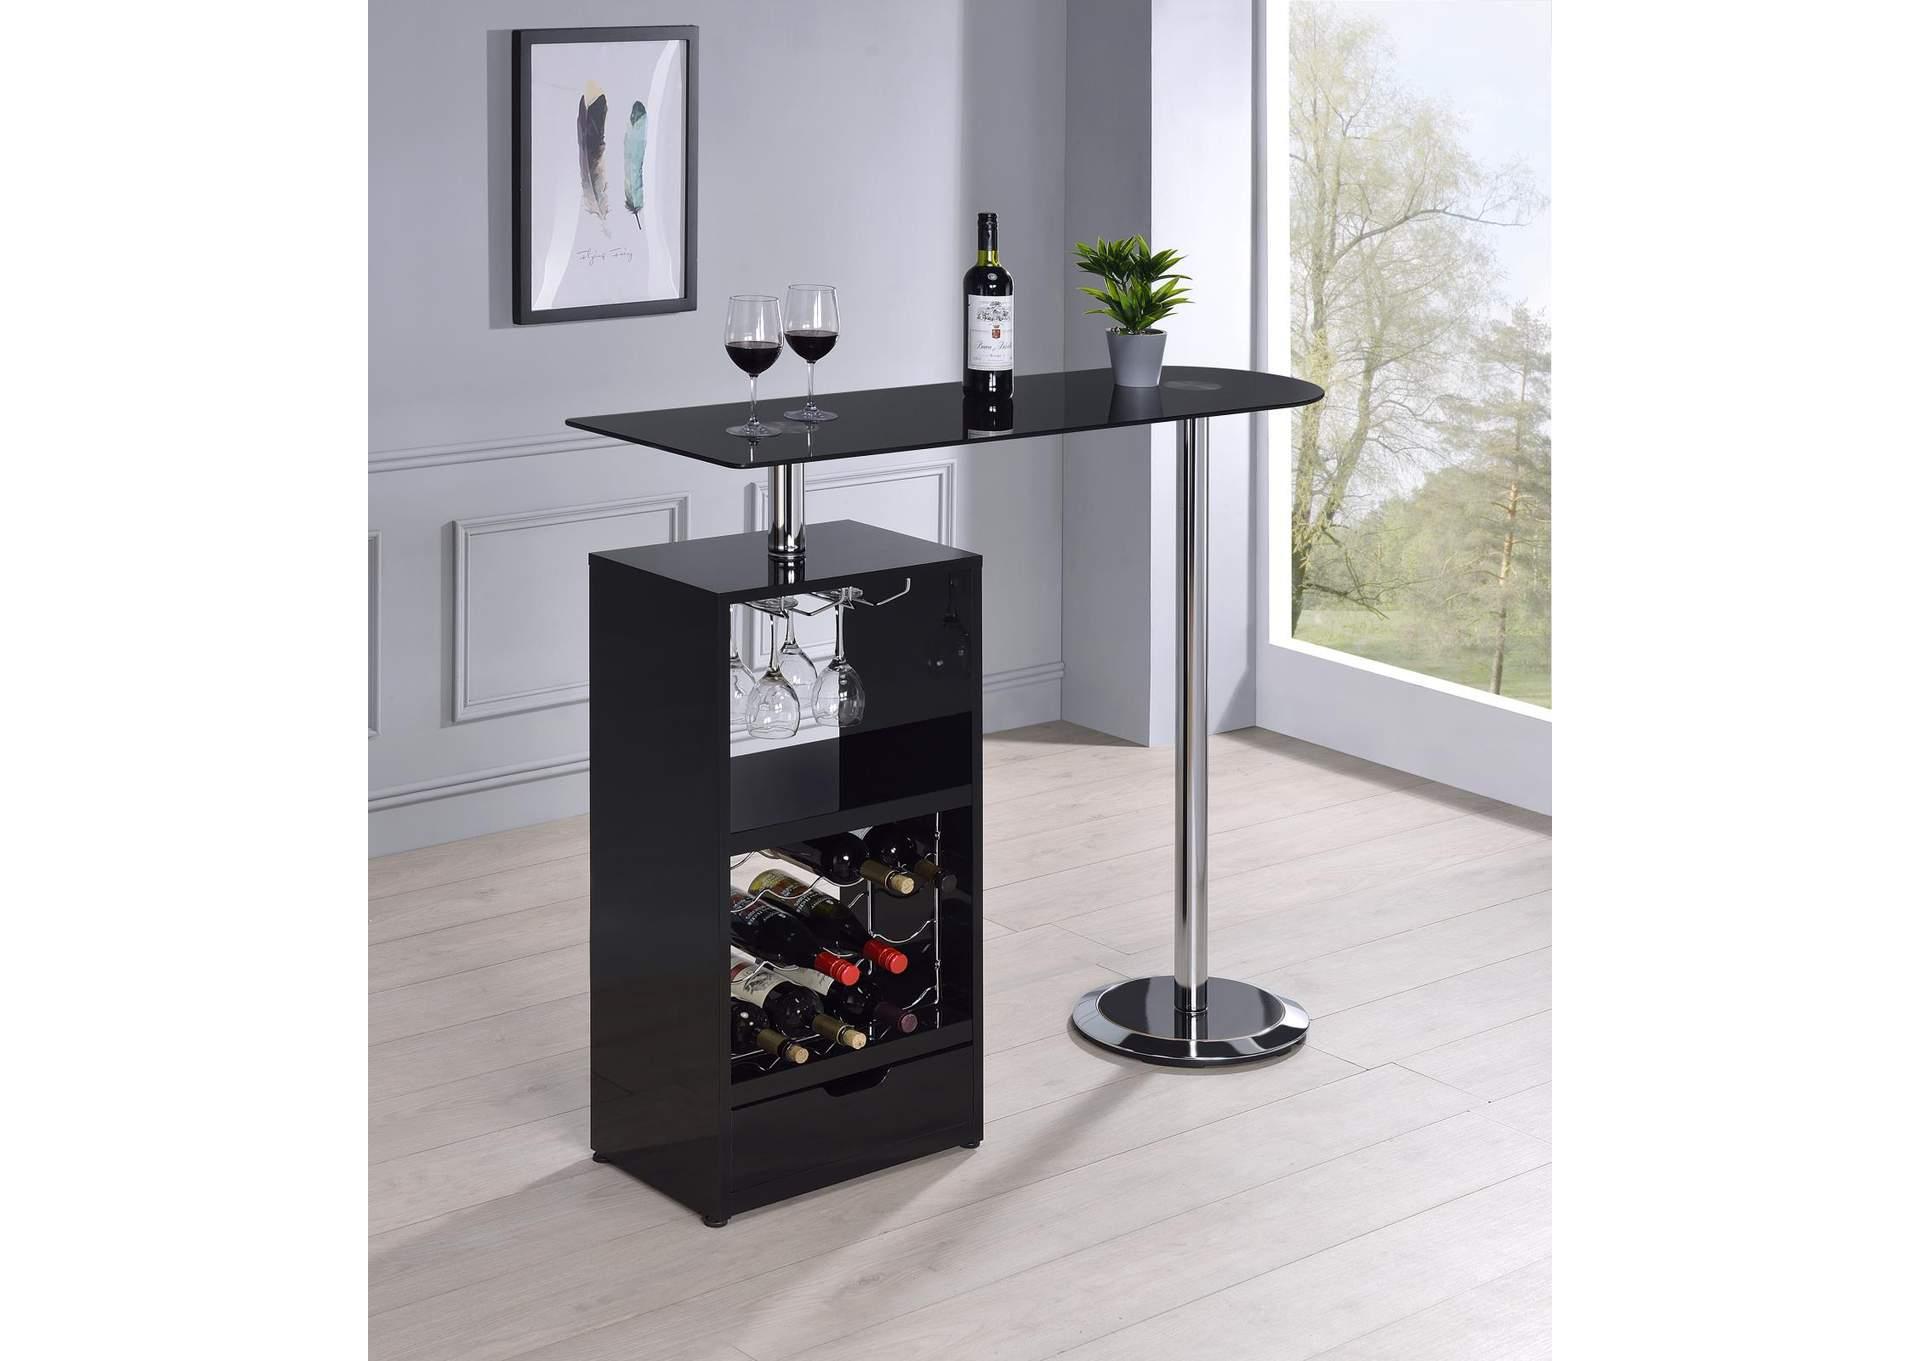 Selmers Home Furnishing Aberdeen Wa Black Revolving Bar Table